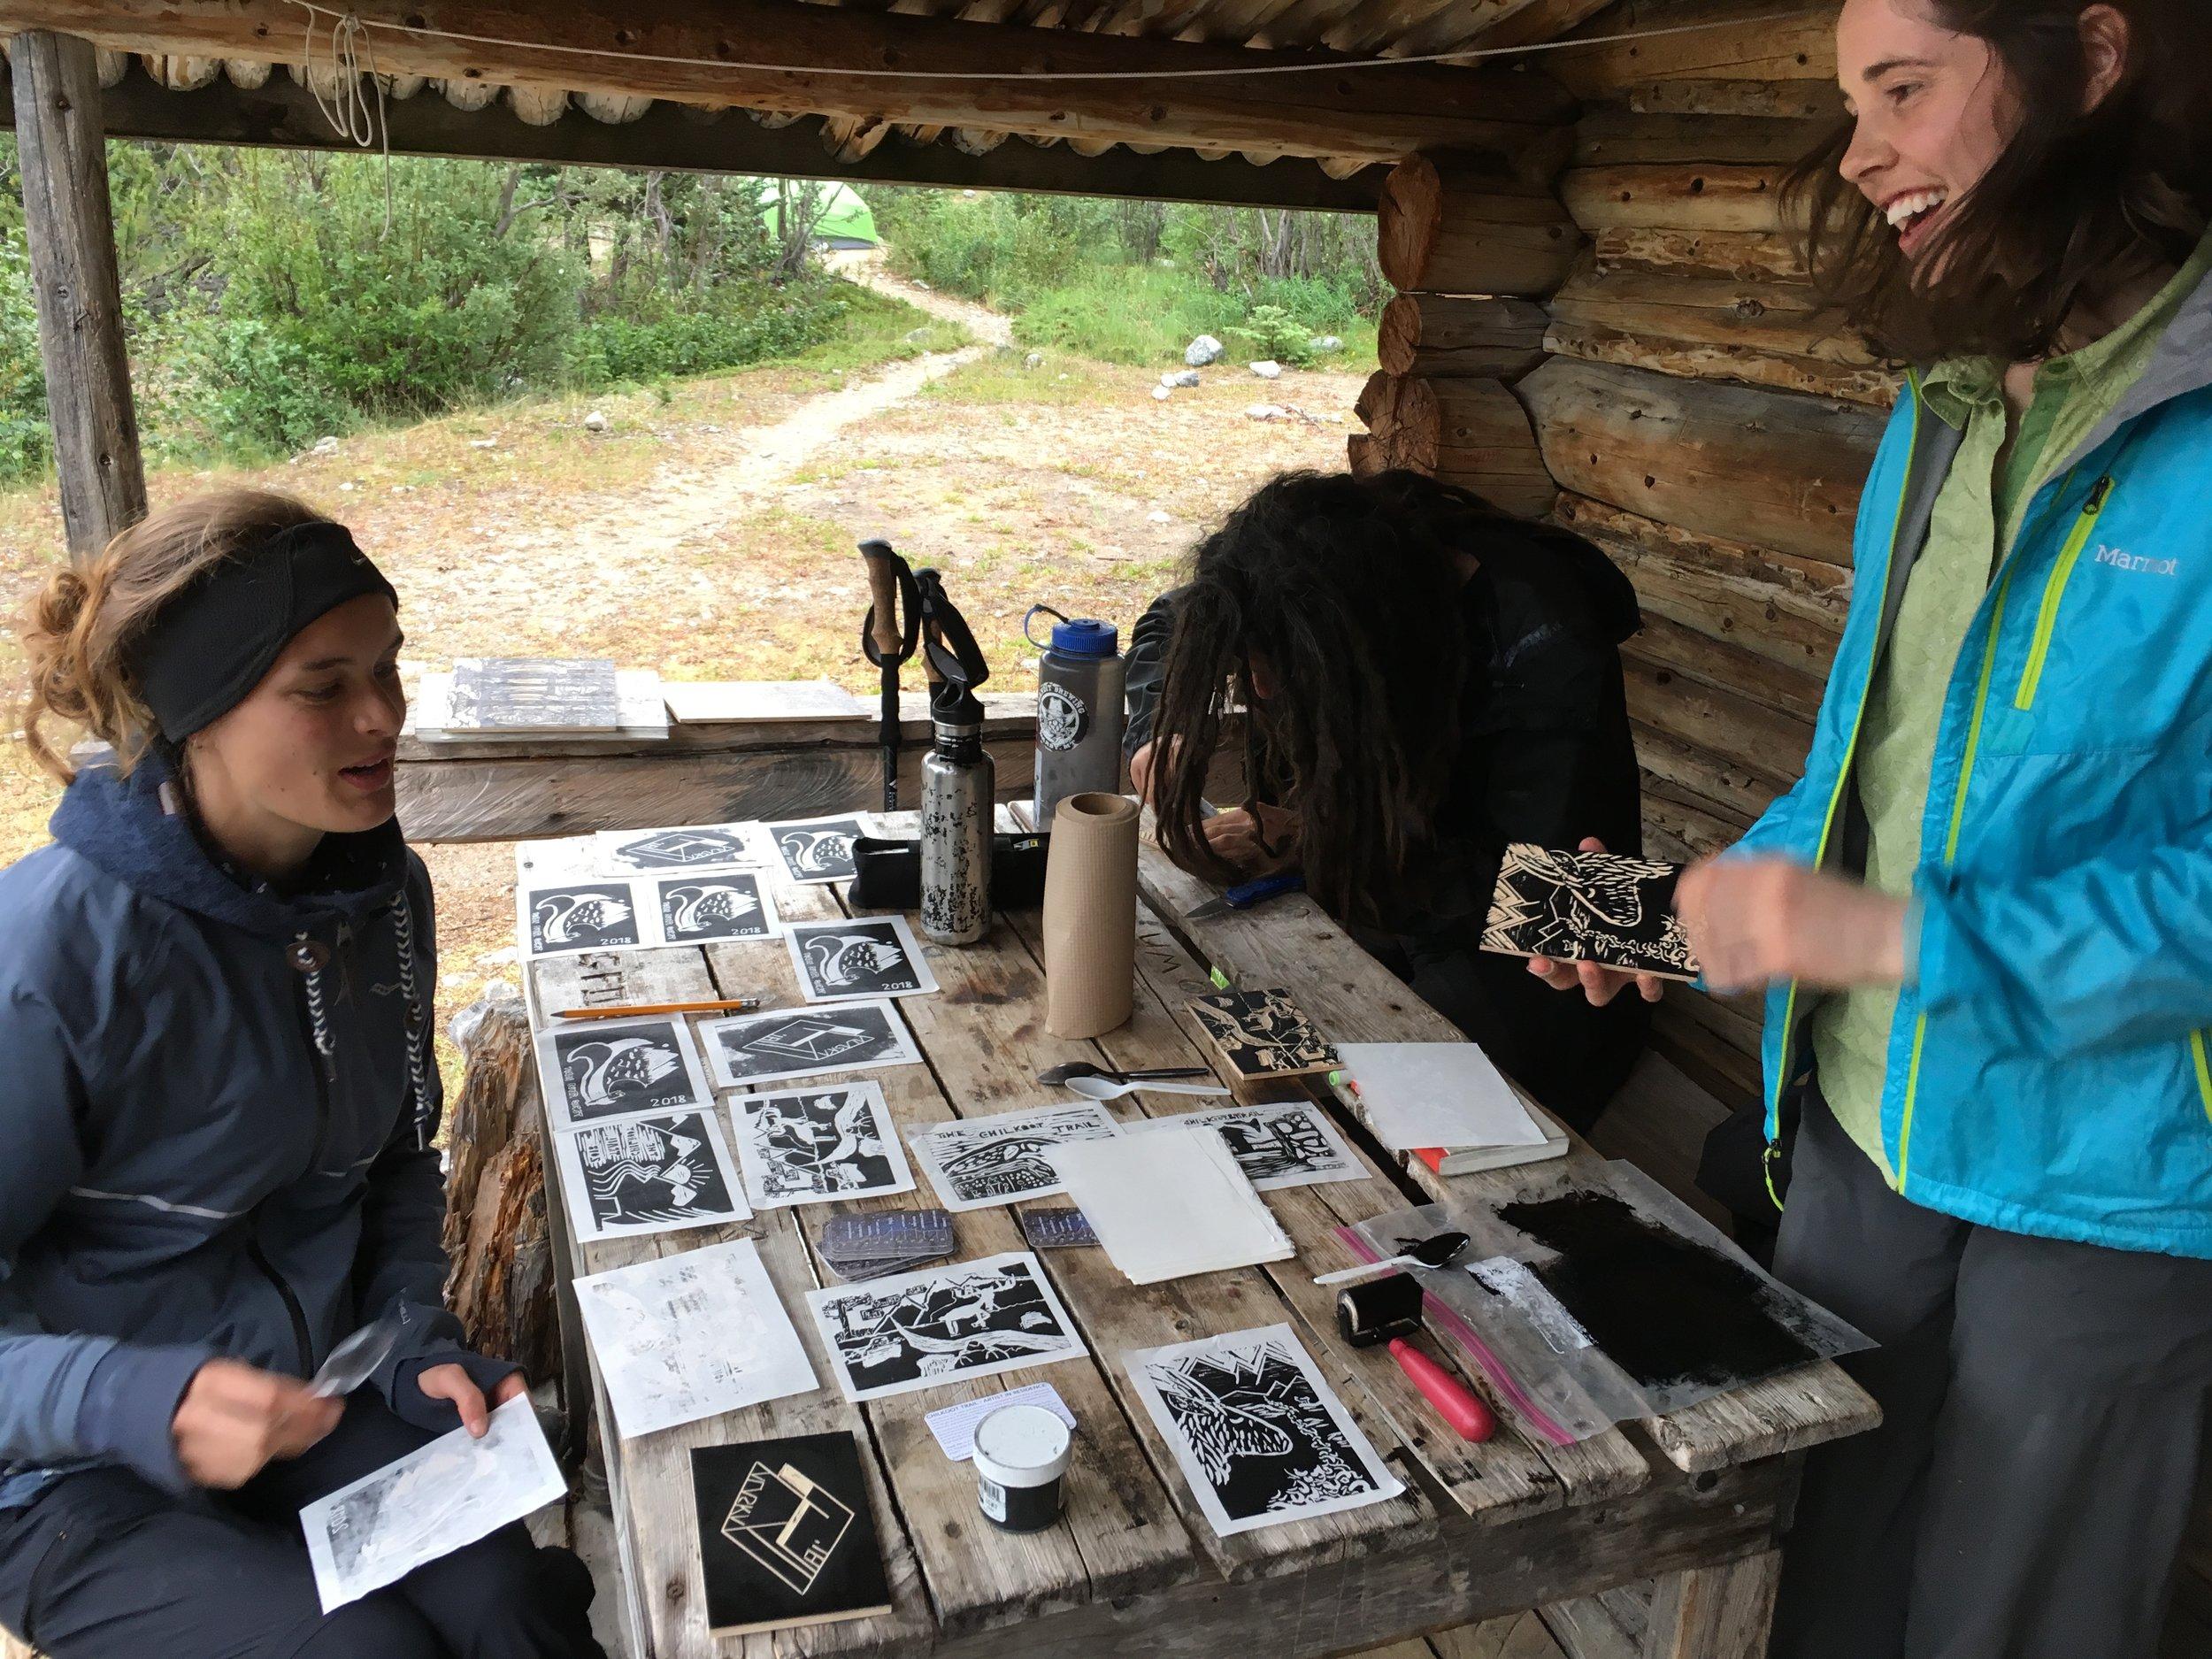 Artist workshop - Lindeman City Camp